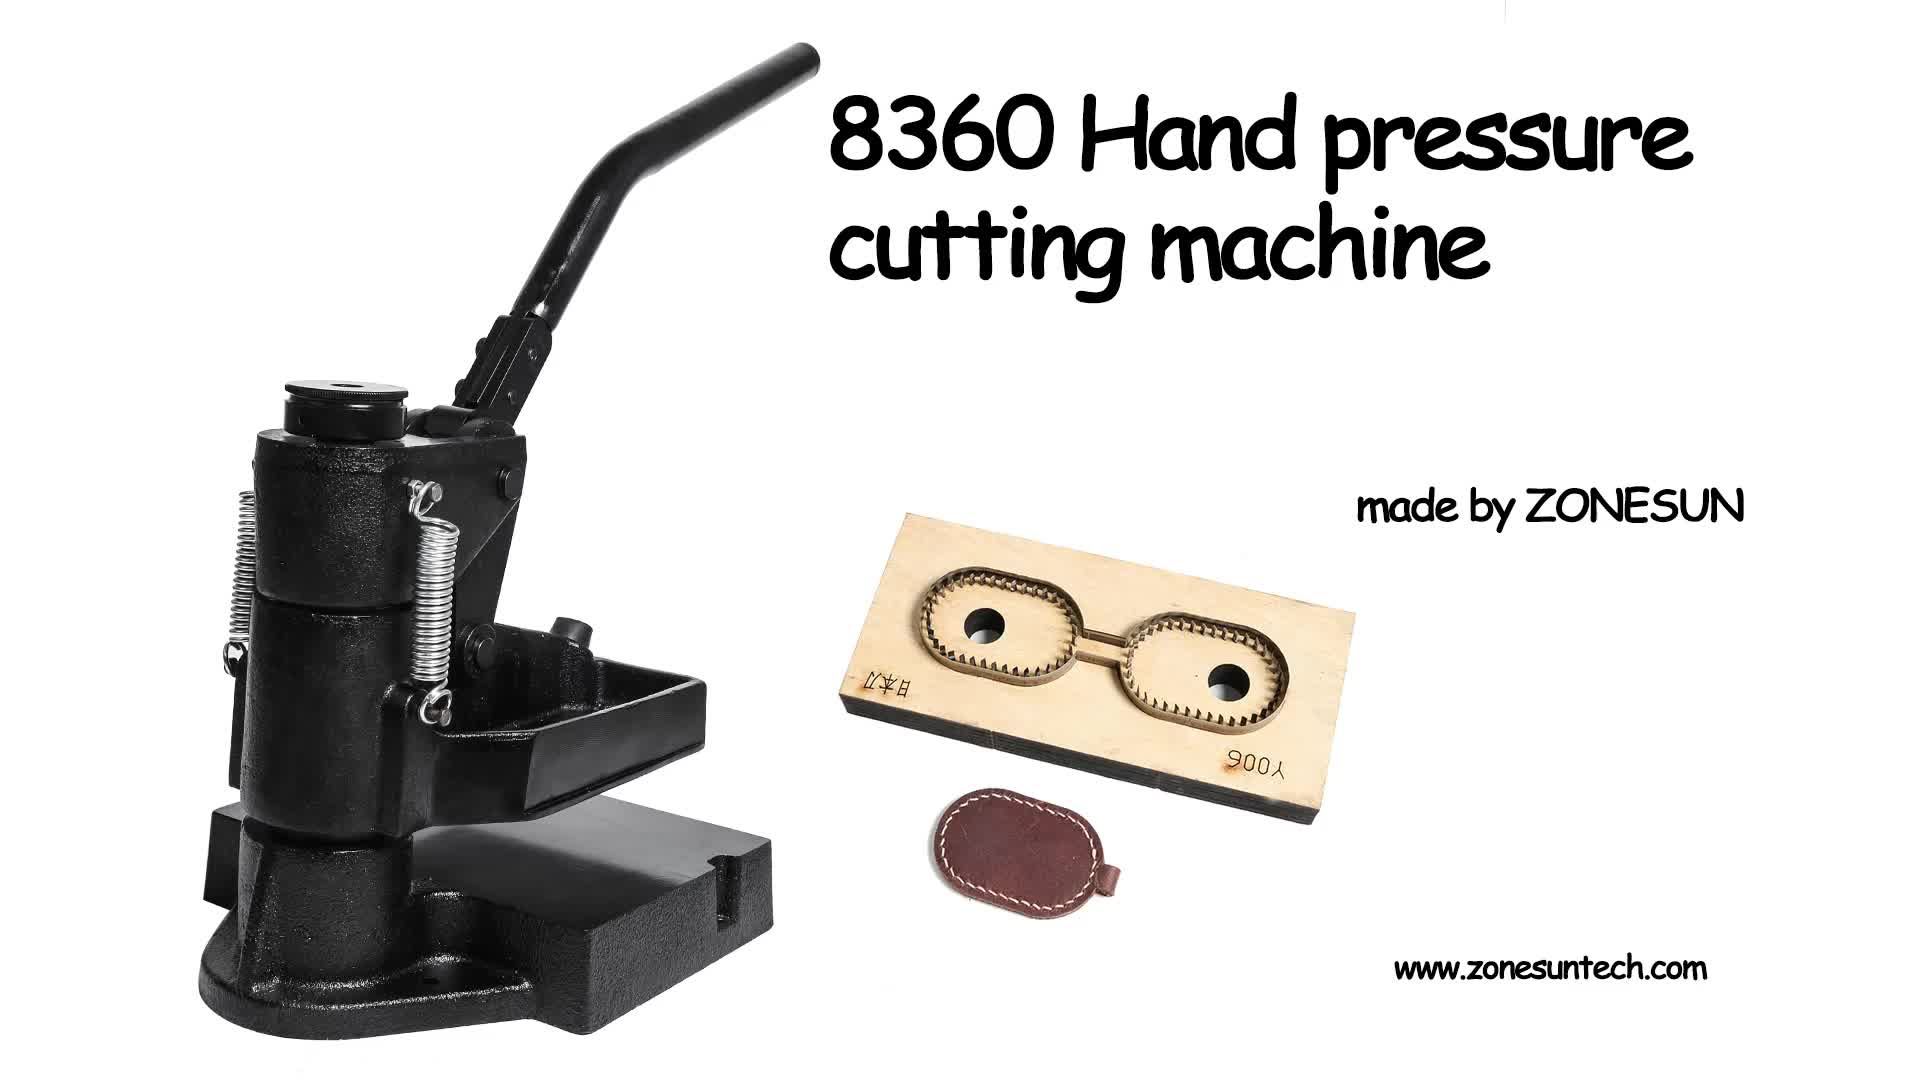 ZONESUN Hand pressure sampling machine Laser knife mold leather stamping machine manual leather mold Die cutting machine